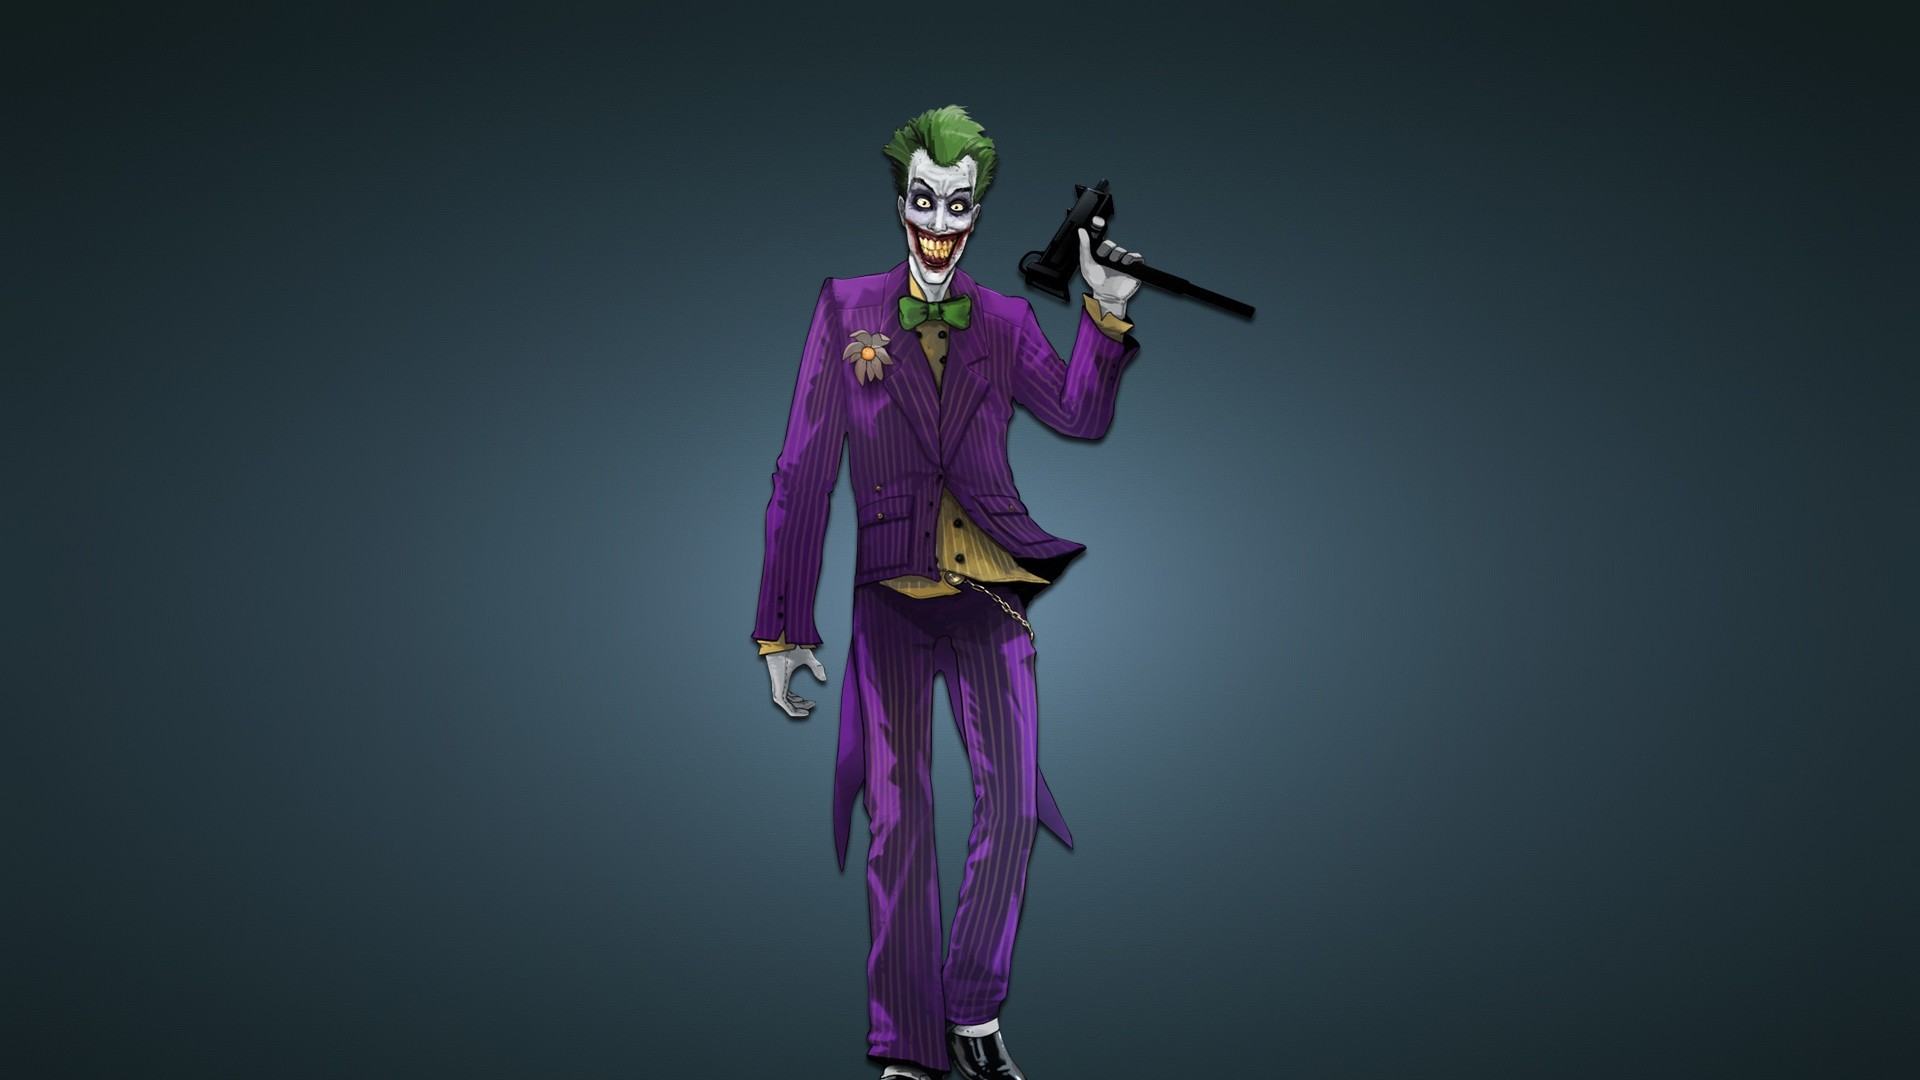 Joker Backgrounds 71 Pictures